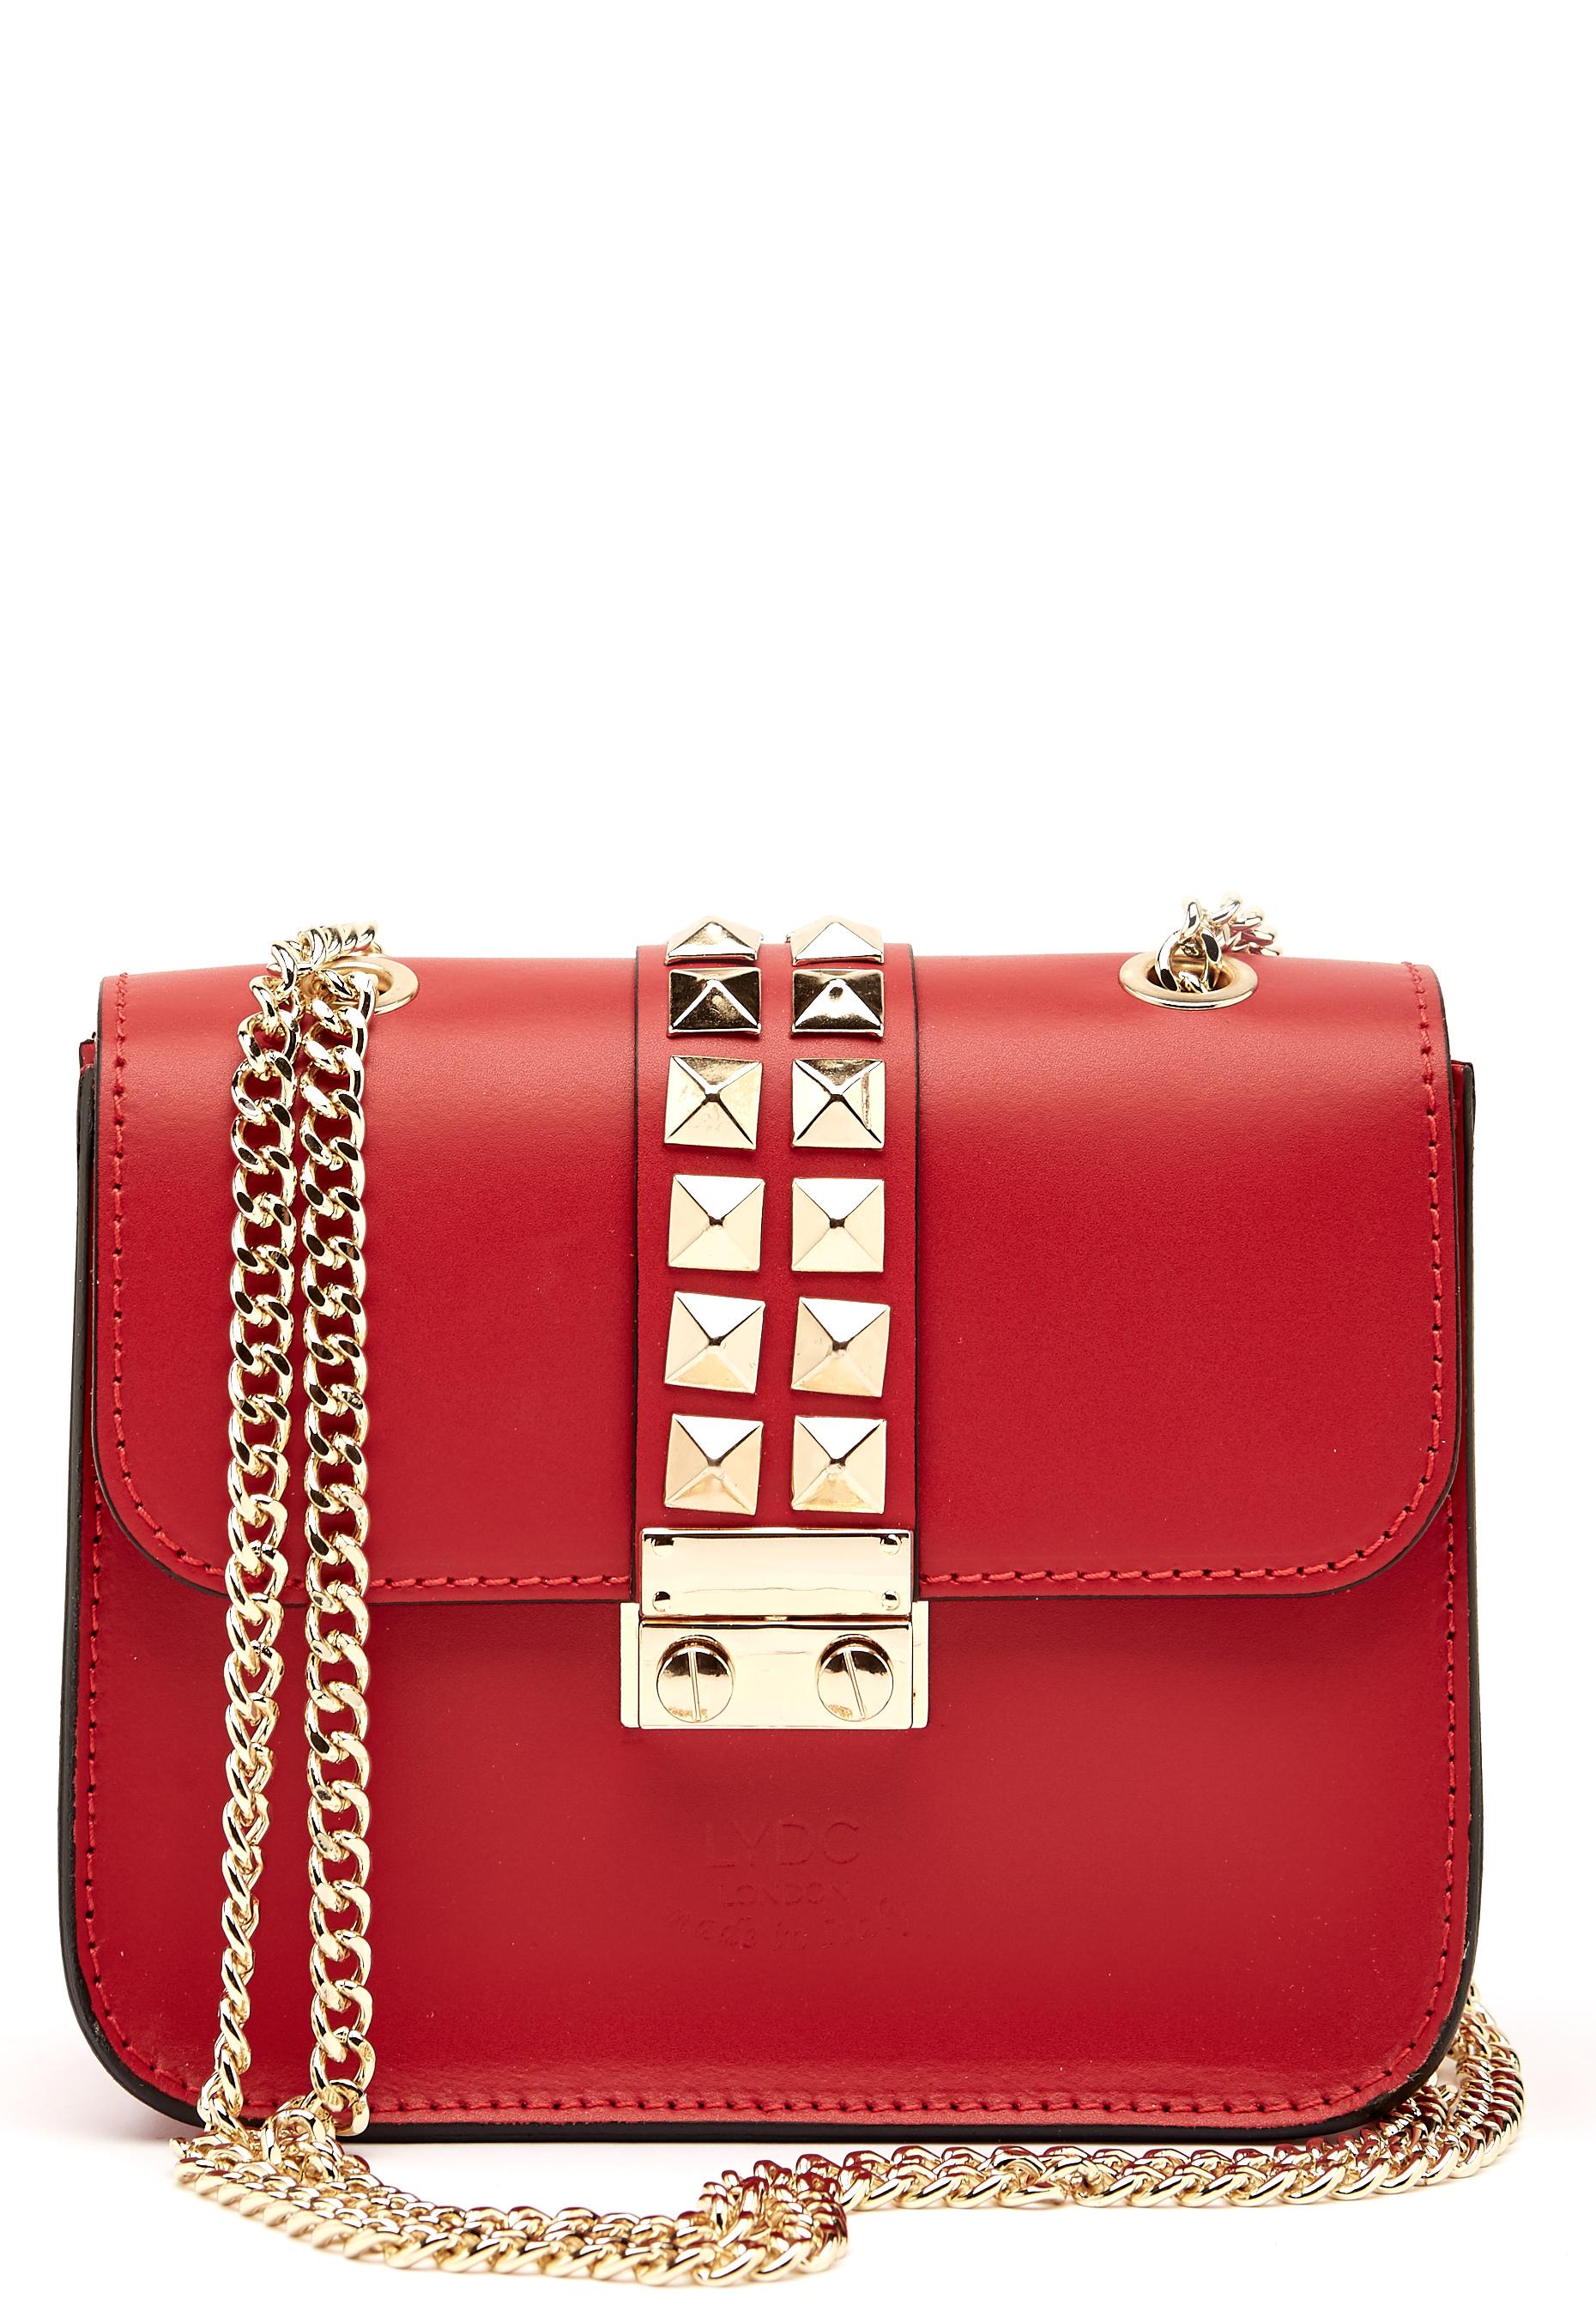 LYDC London Crossbody Bag Red - Bubbleroom 544507a83f